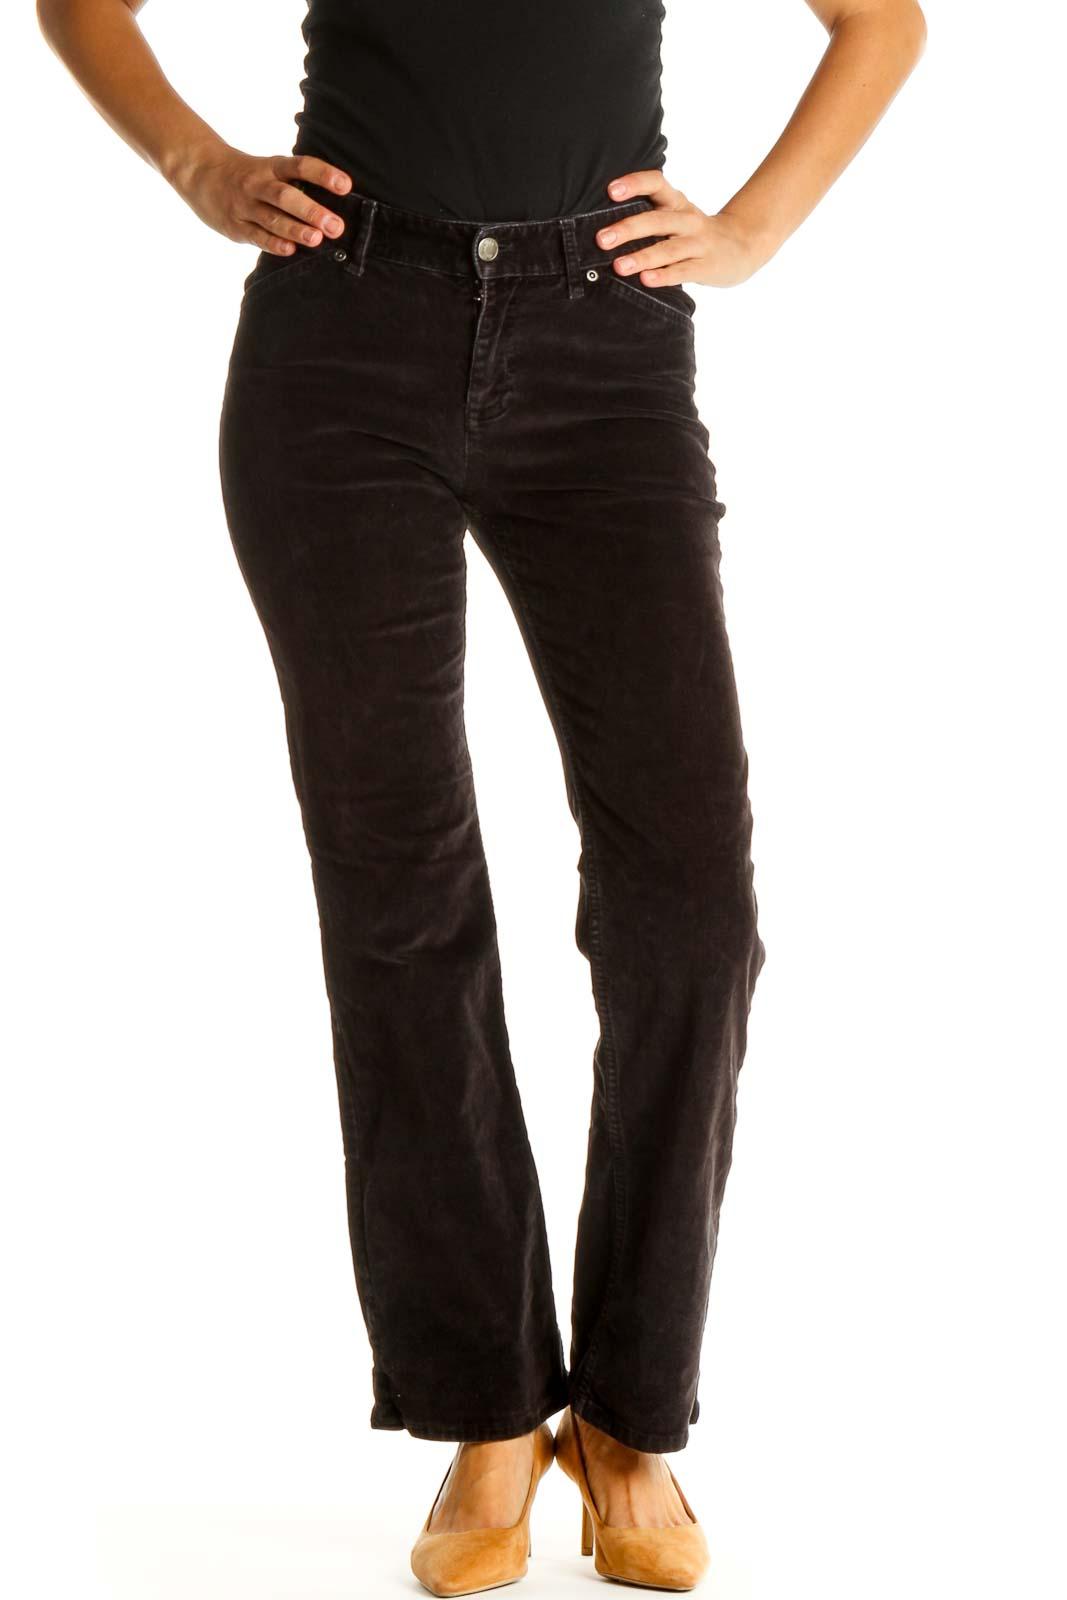 Black Straight Leg Corduroy Jeans Front